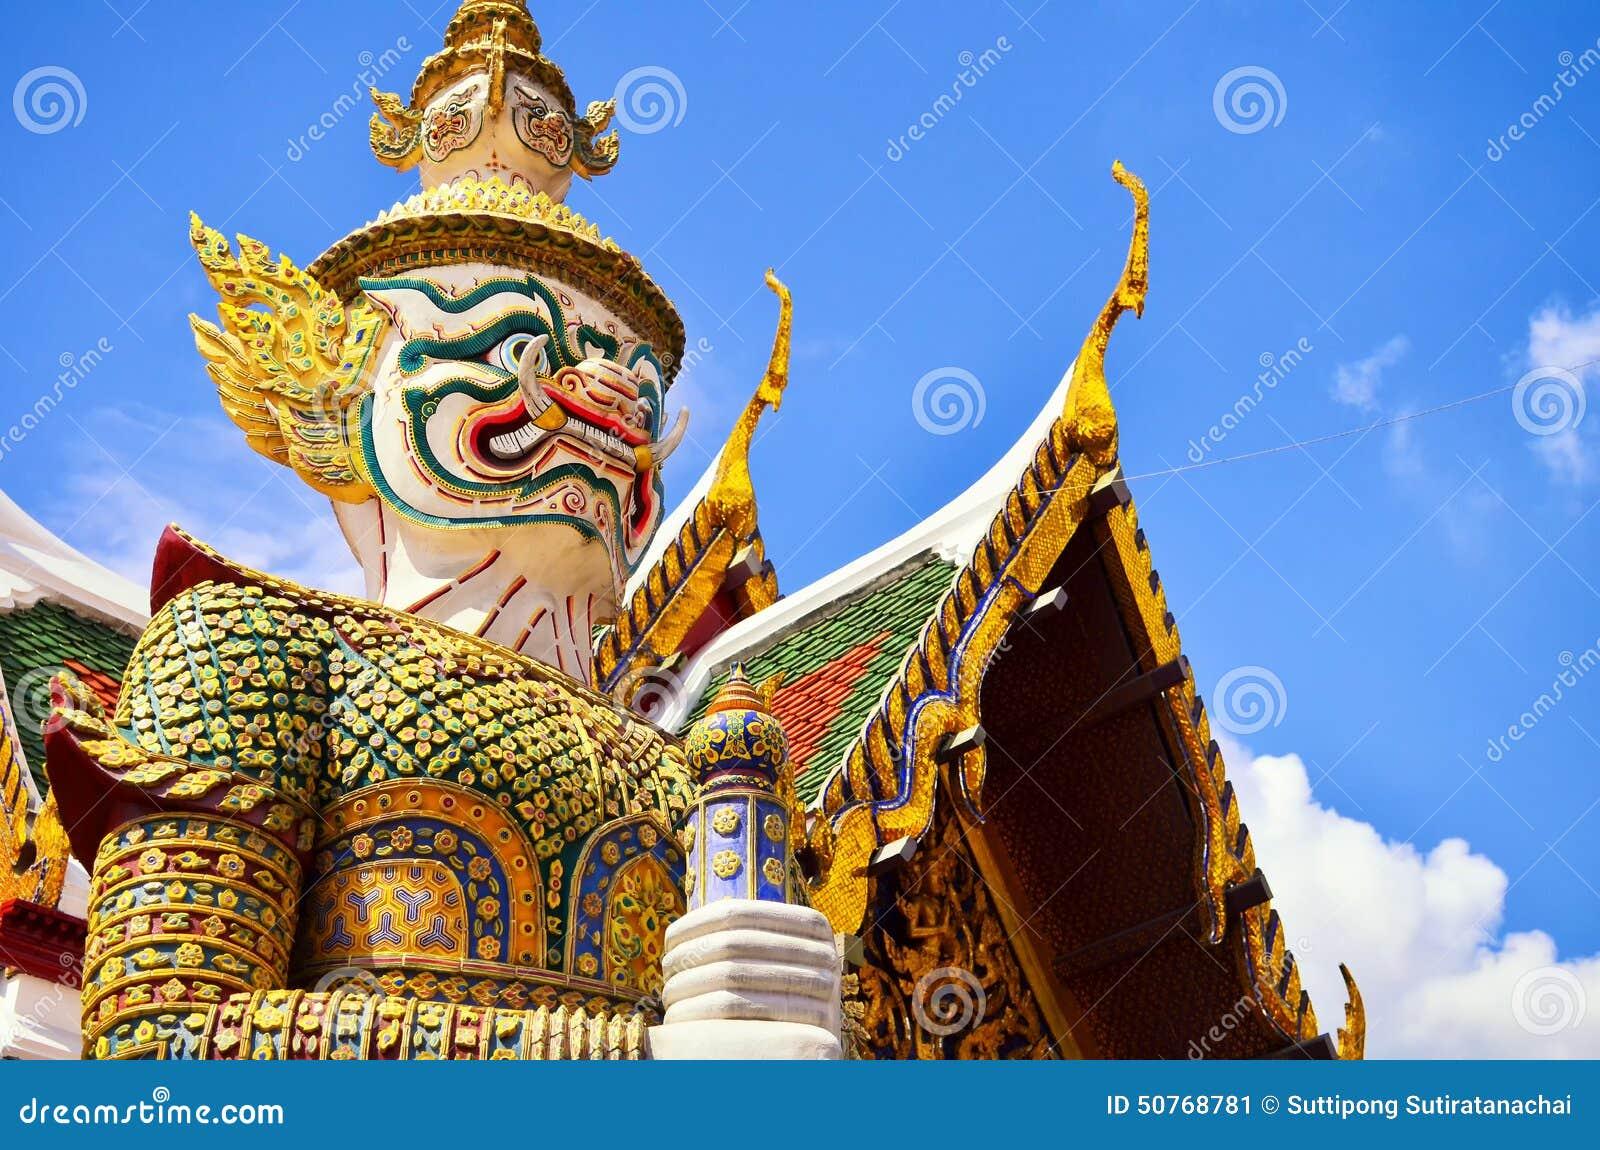 Giants in Grand palace and Wat Pra Keaw, Bangkok